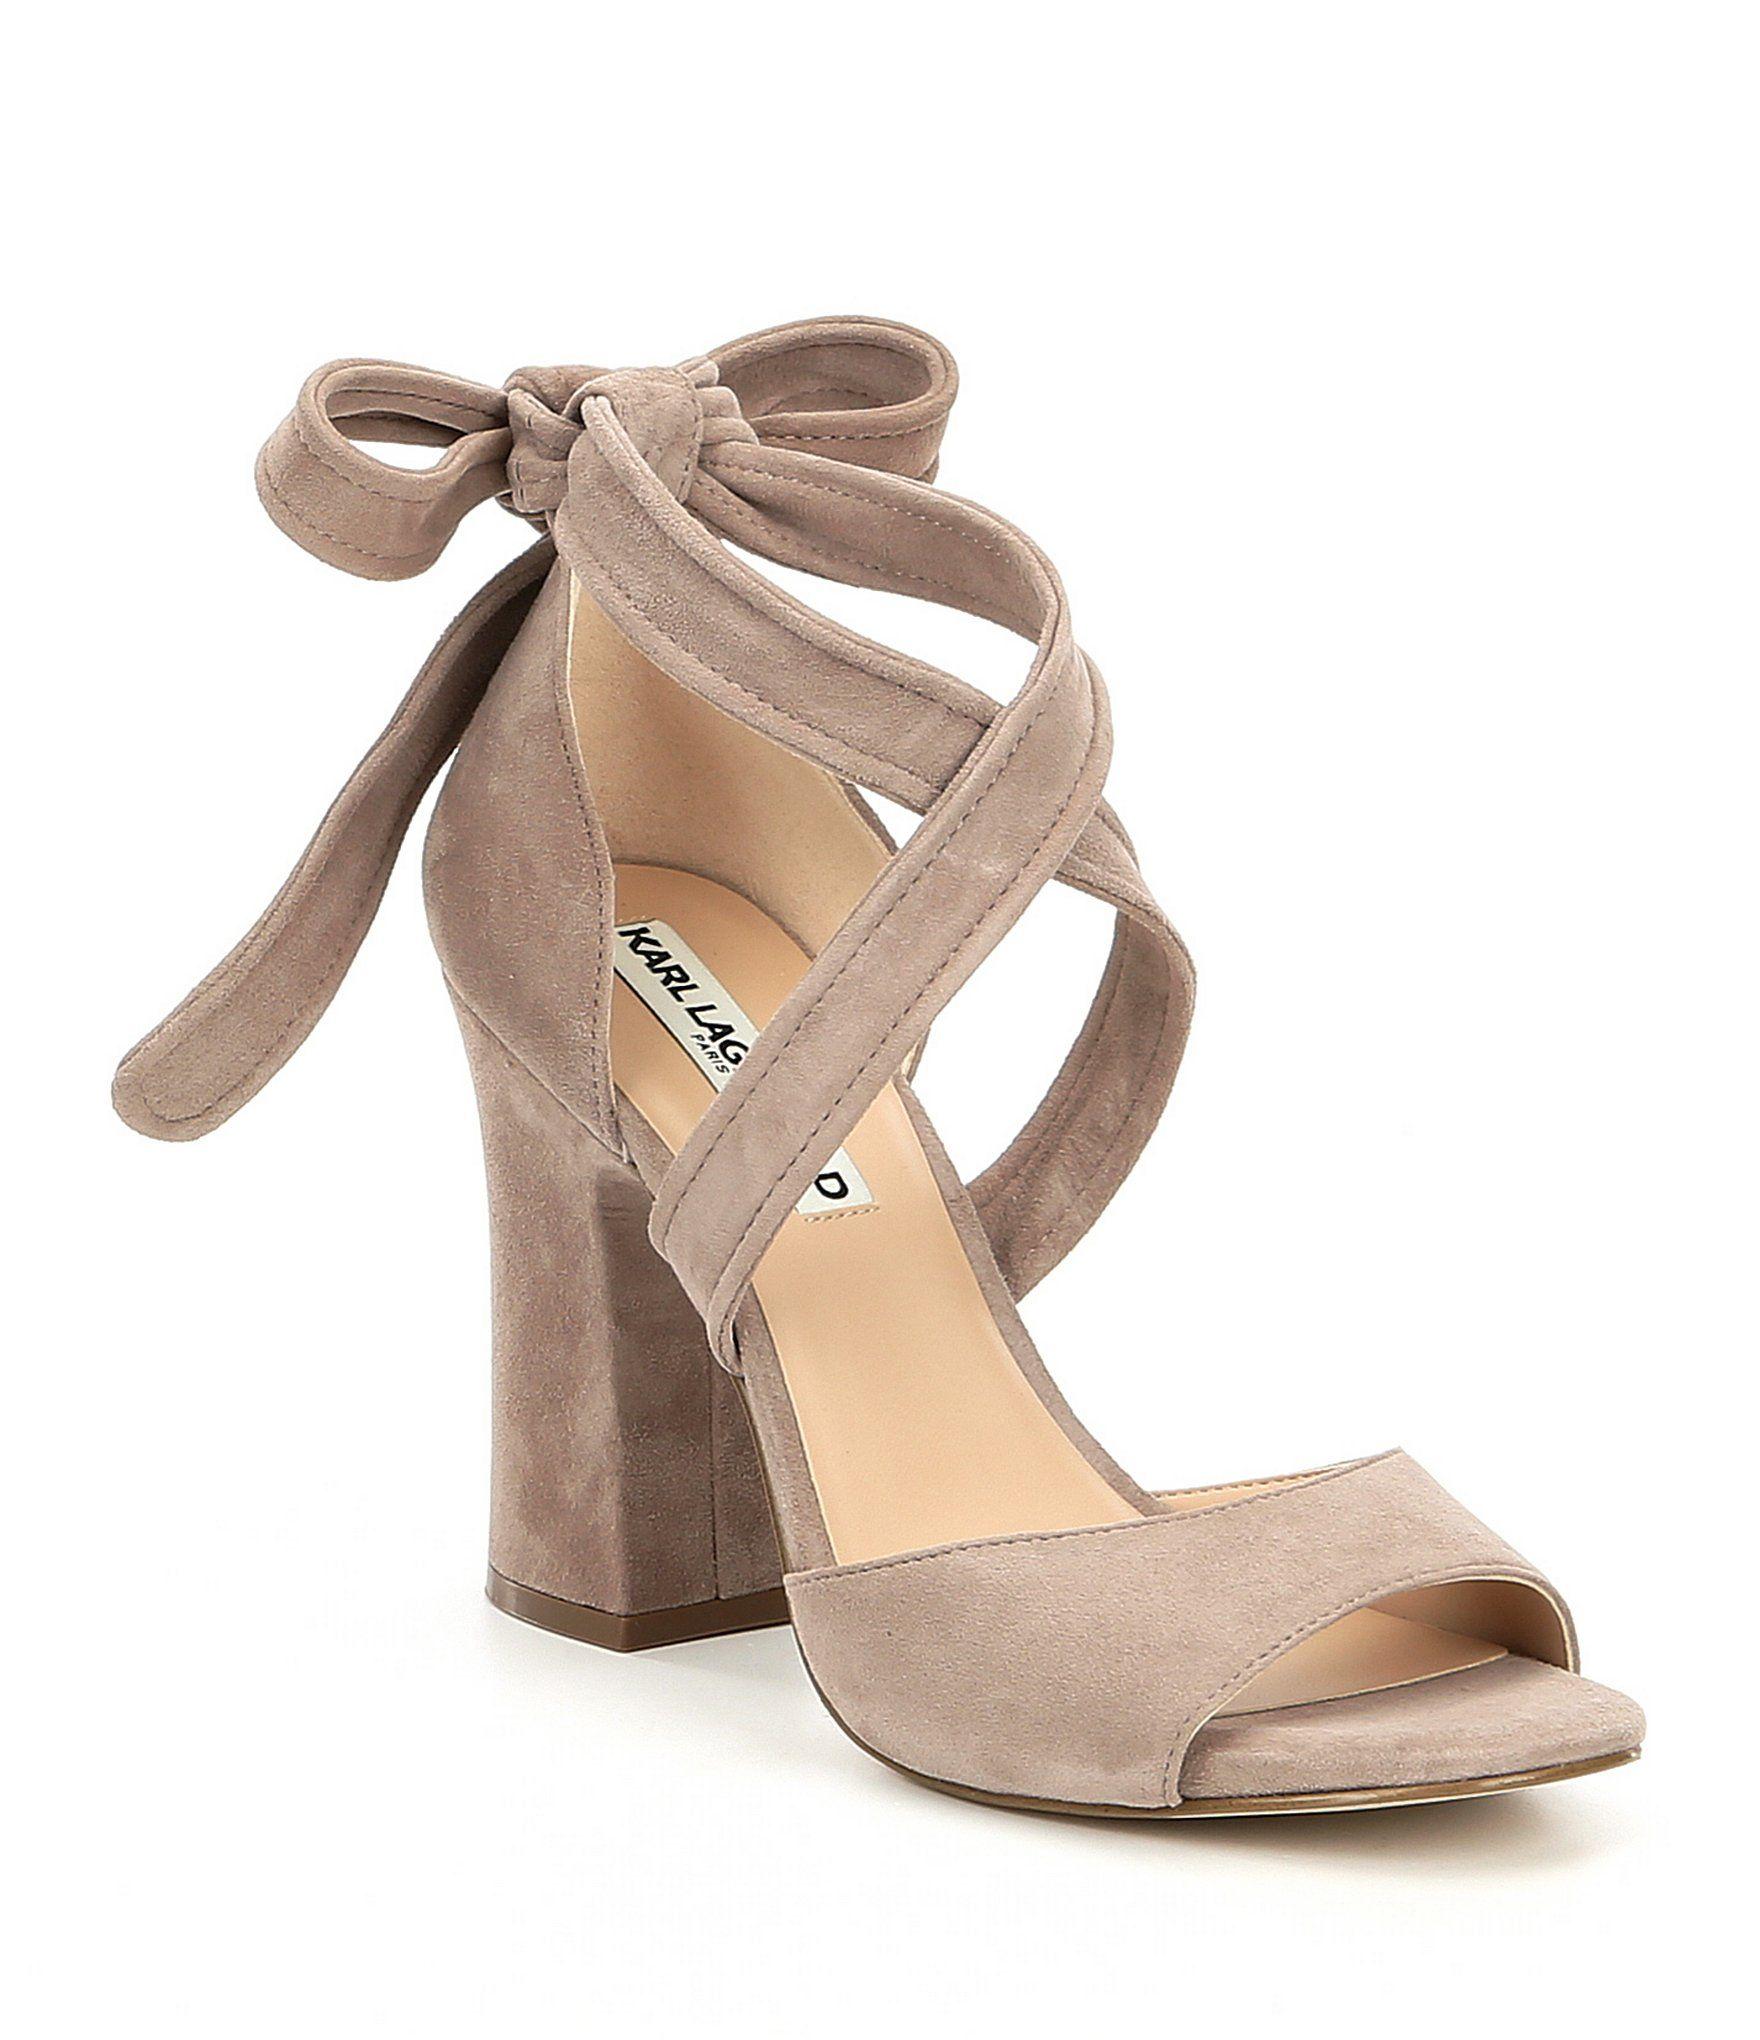 5a0118db895 KARL LAGERFELD PARIS Racha Suede Ankle Tie Block Heel Dress Sandals   Dillards